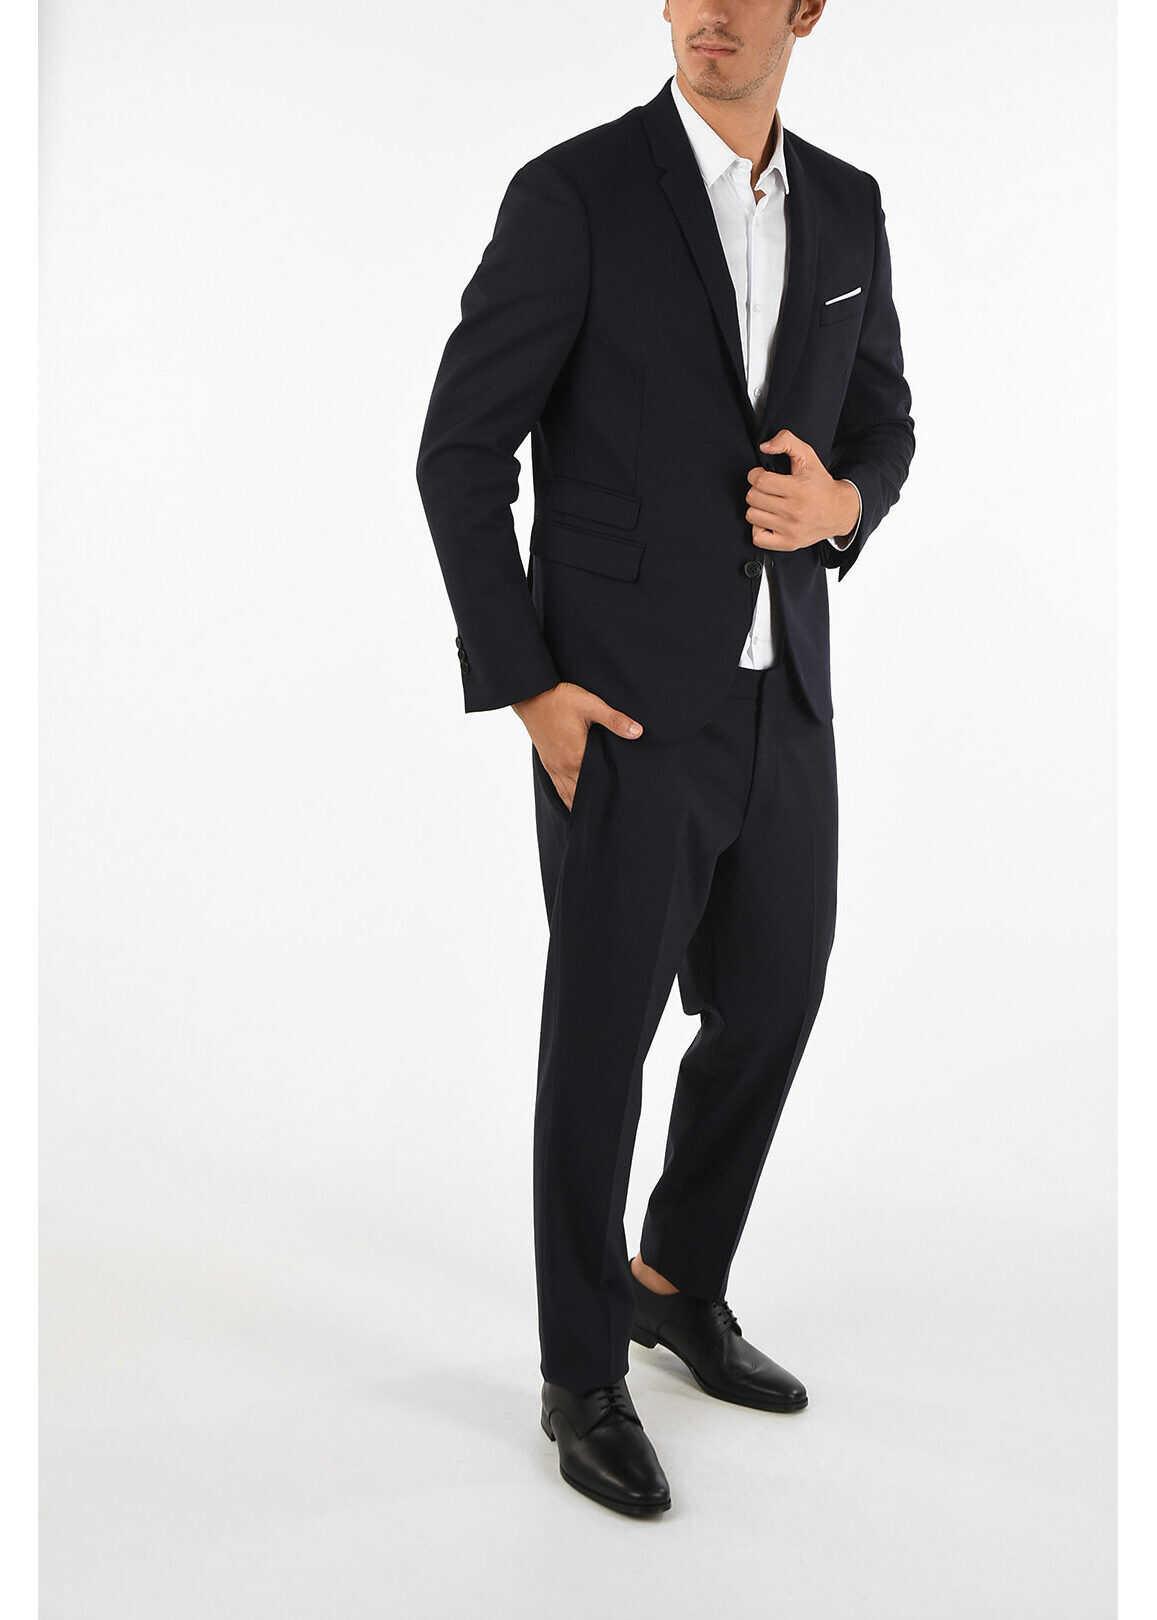 Neil Barrett Slim Fitted Single Breasted Suit BLUE imagine